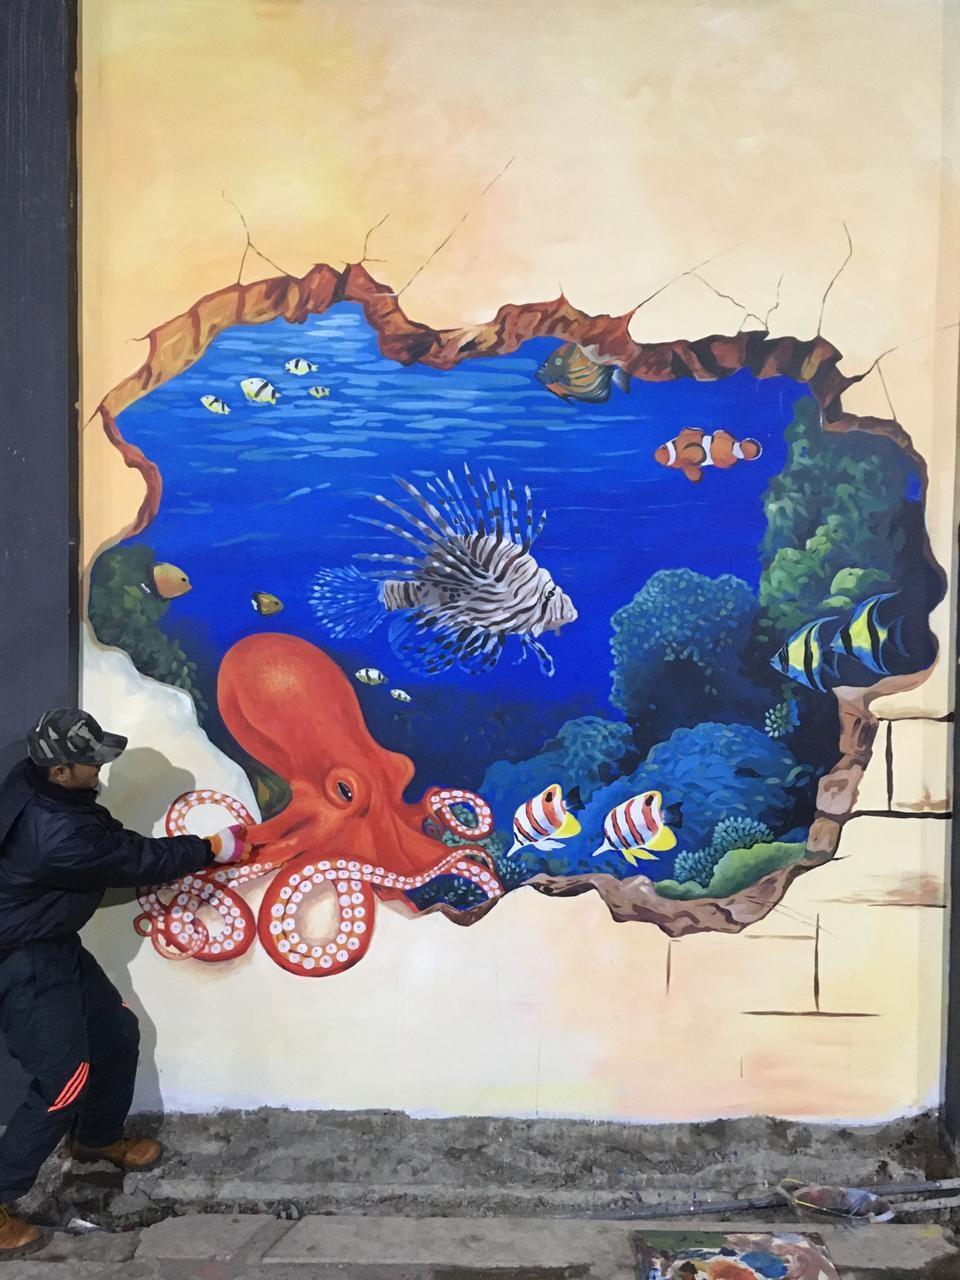 Karya Lukisan Mural Tiga Dimensi Paling Unik